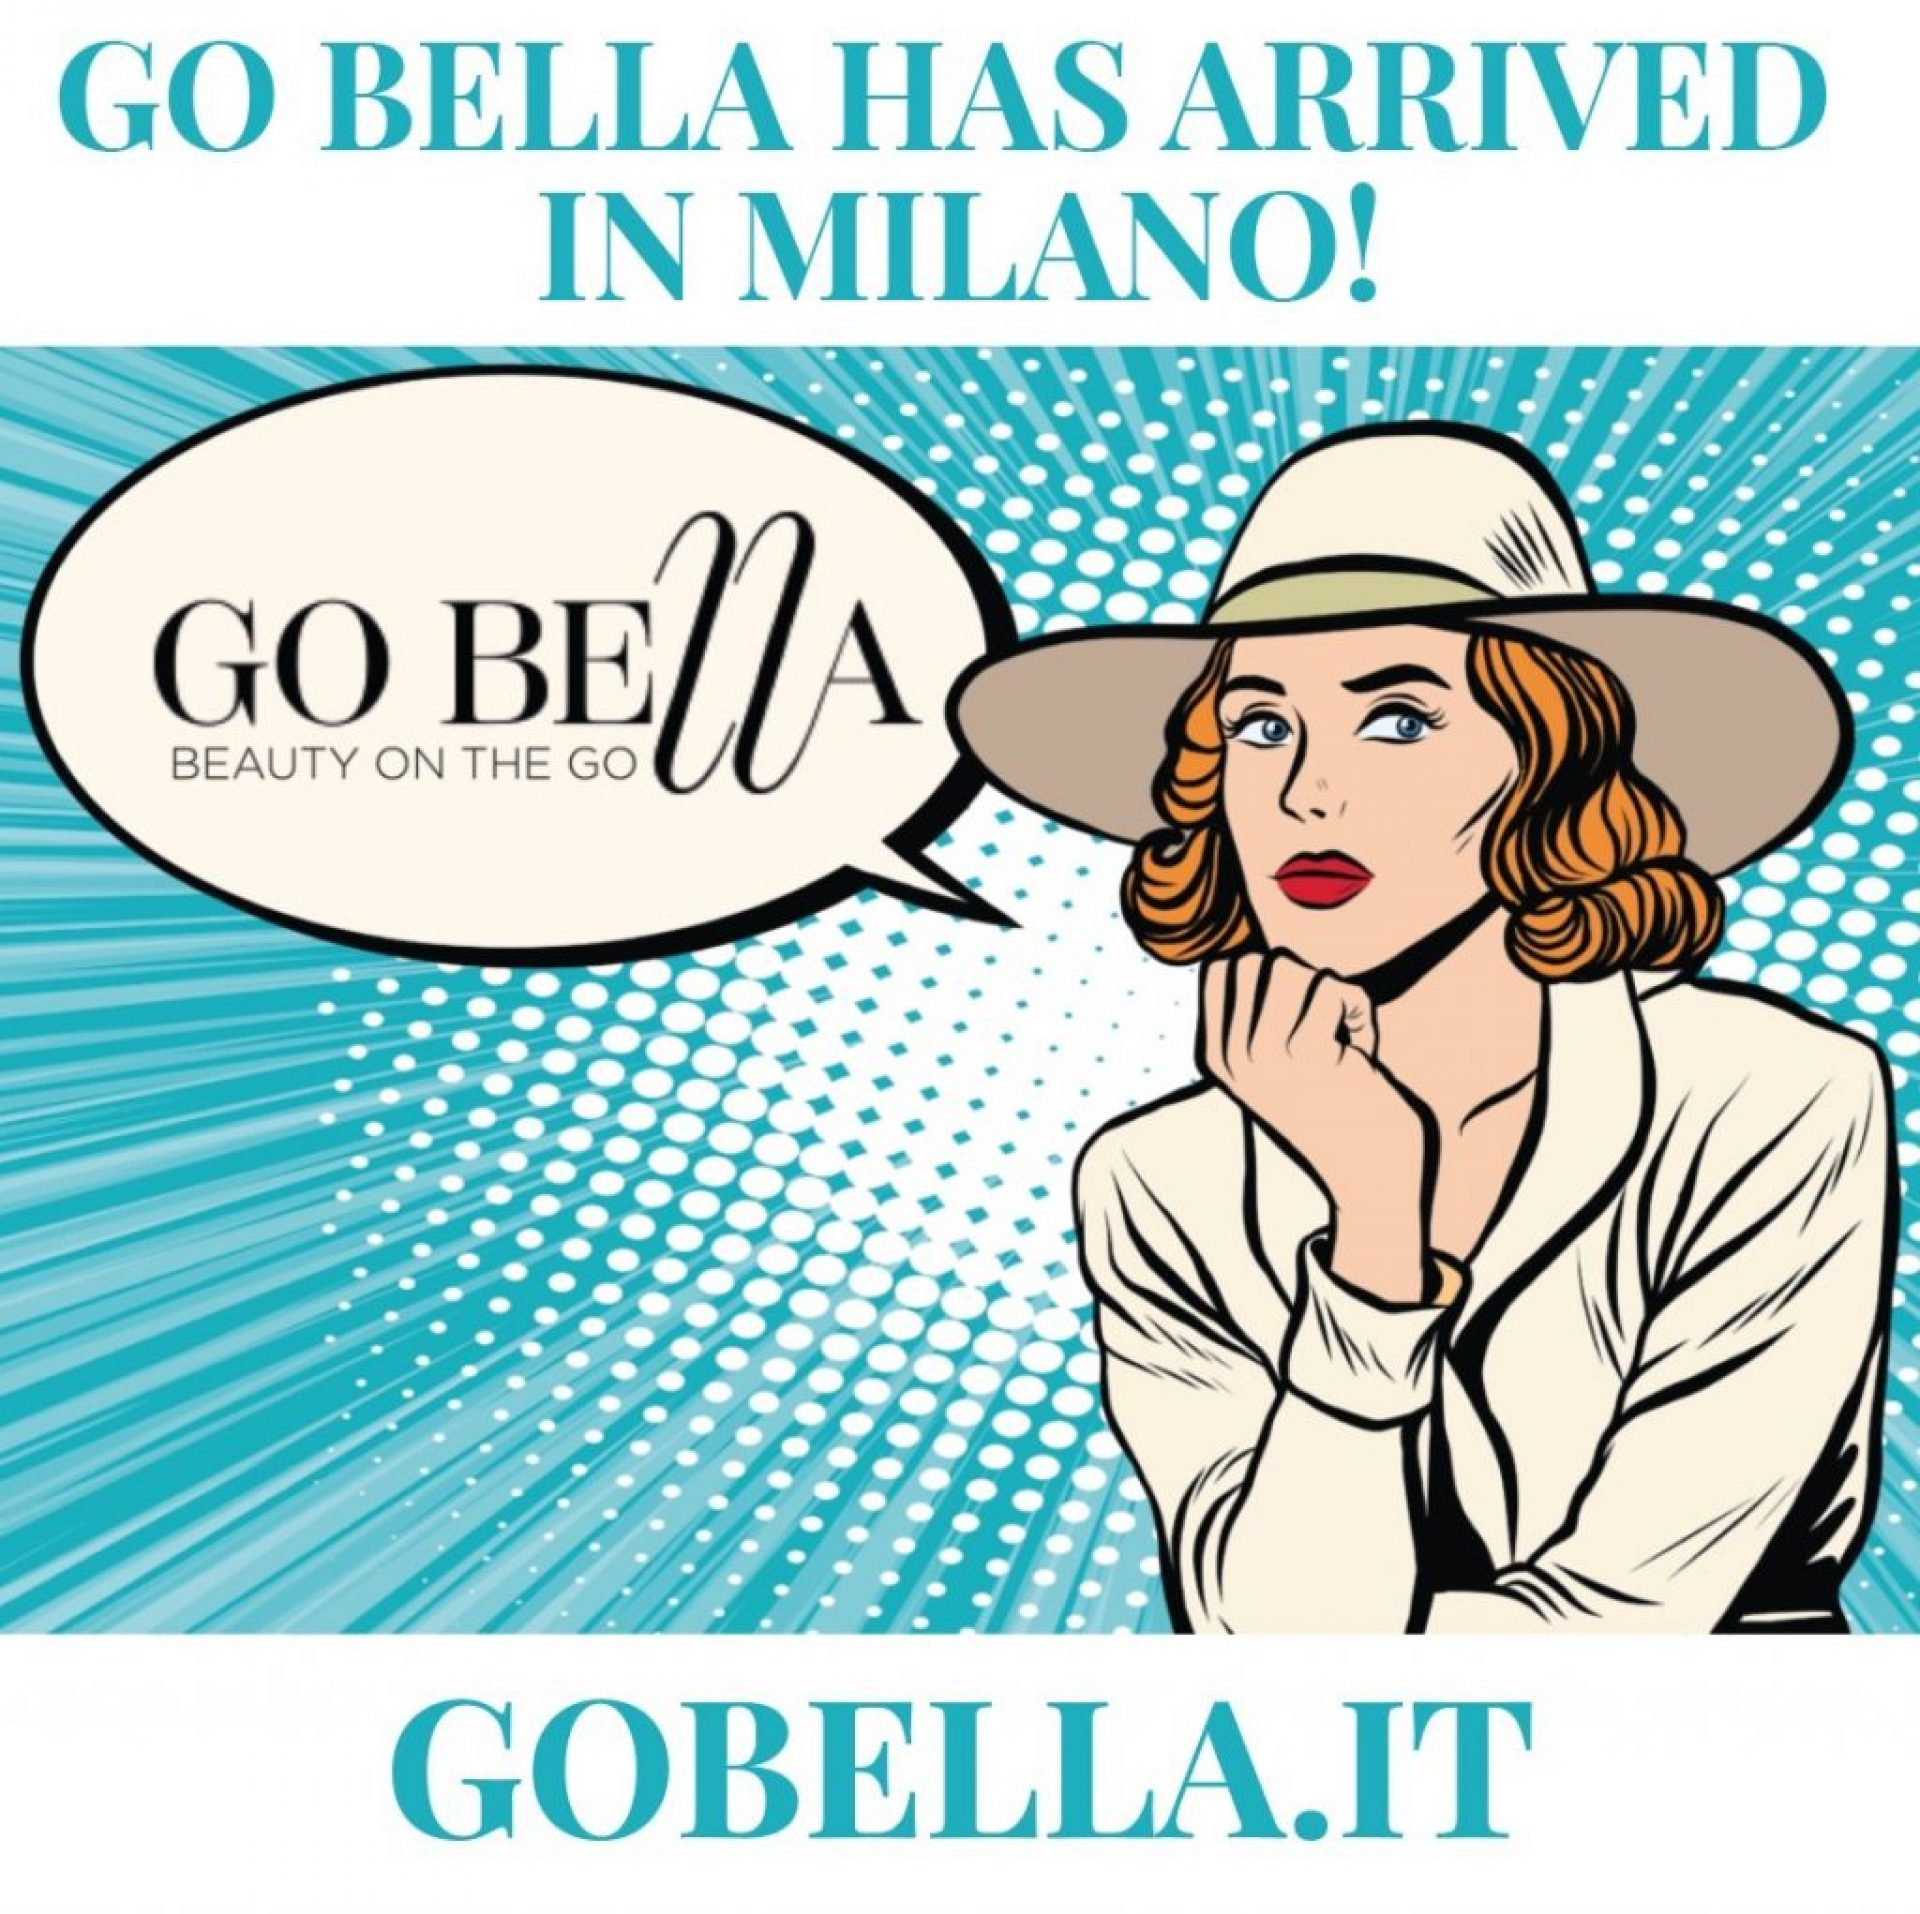 go bella